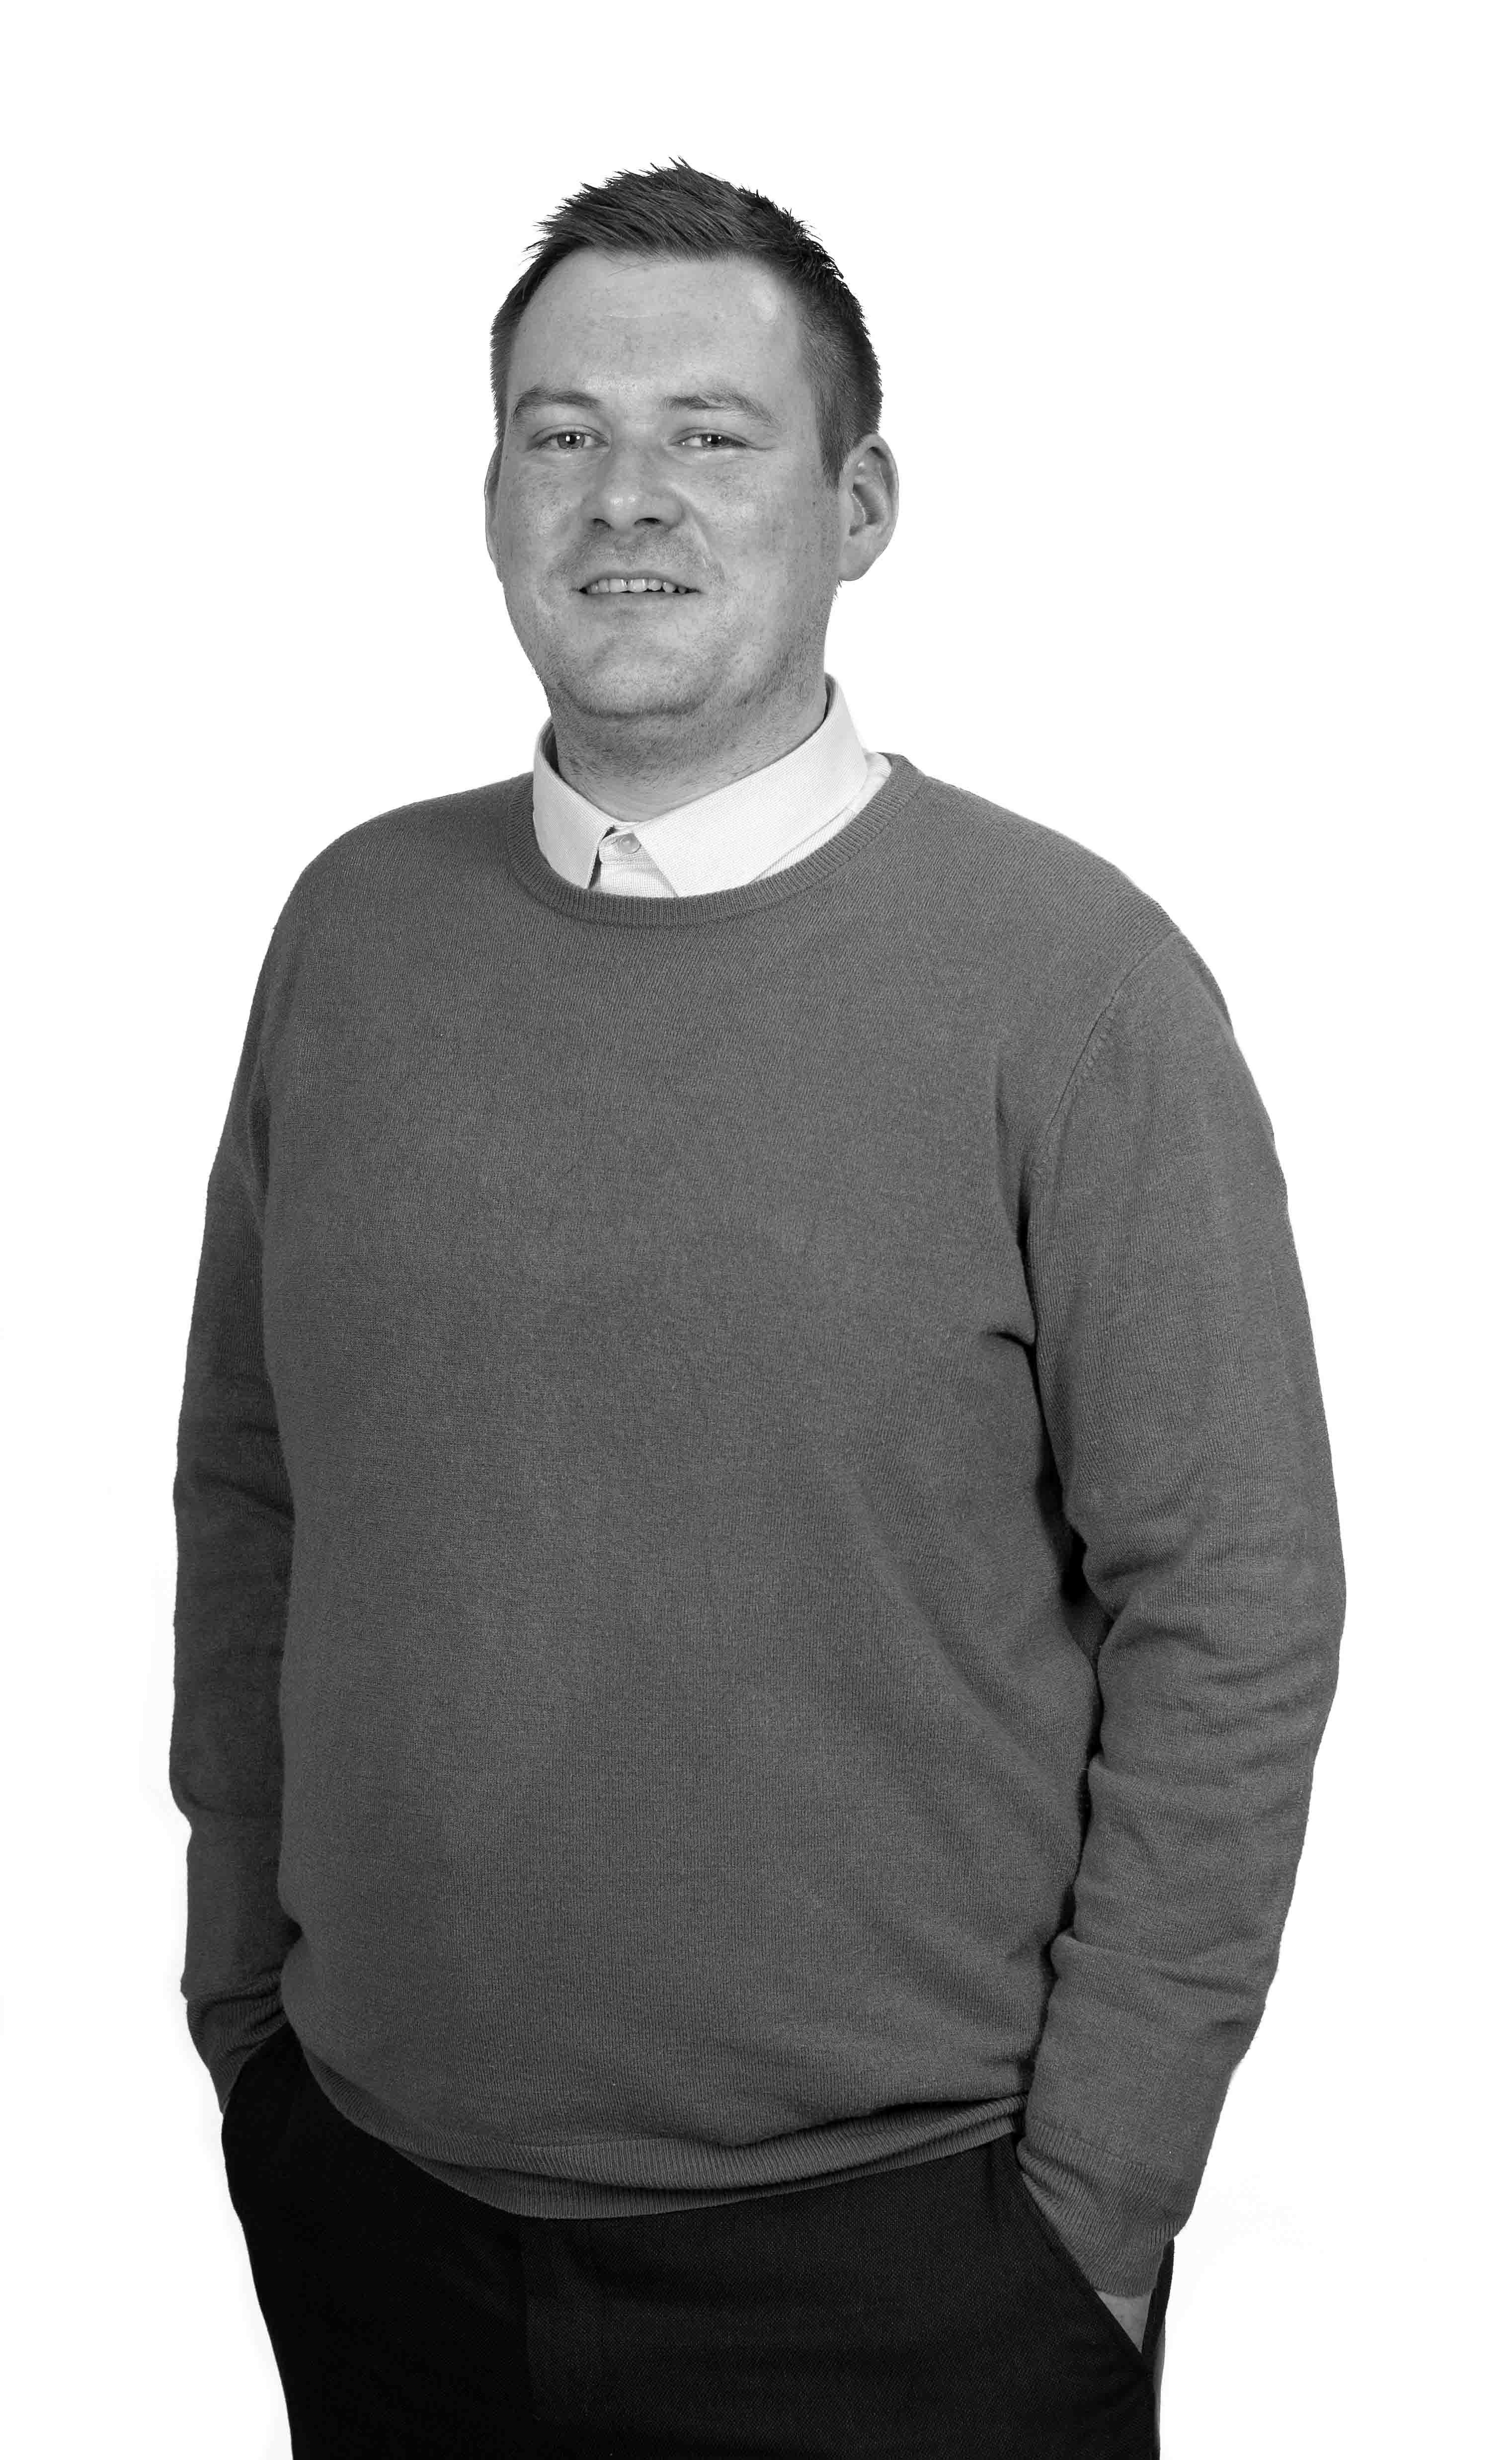 Gavin Maclean